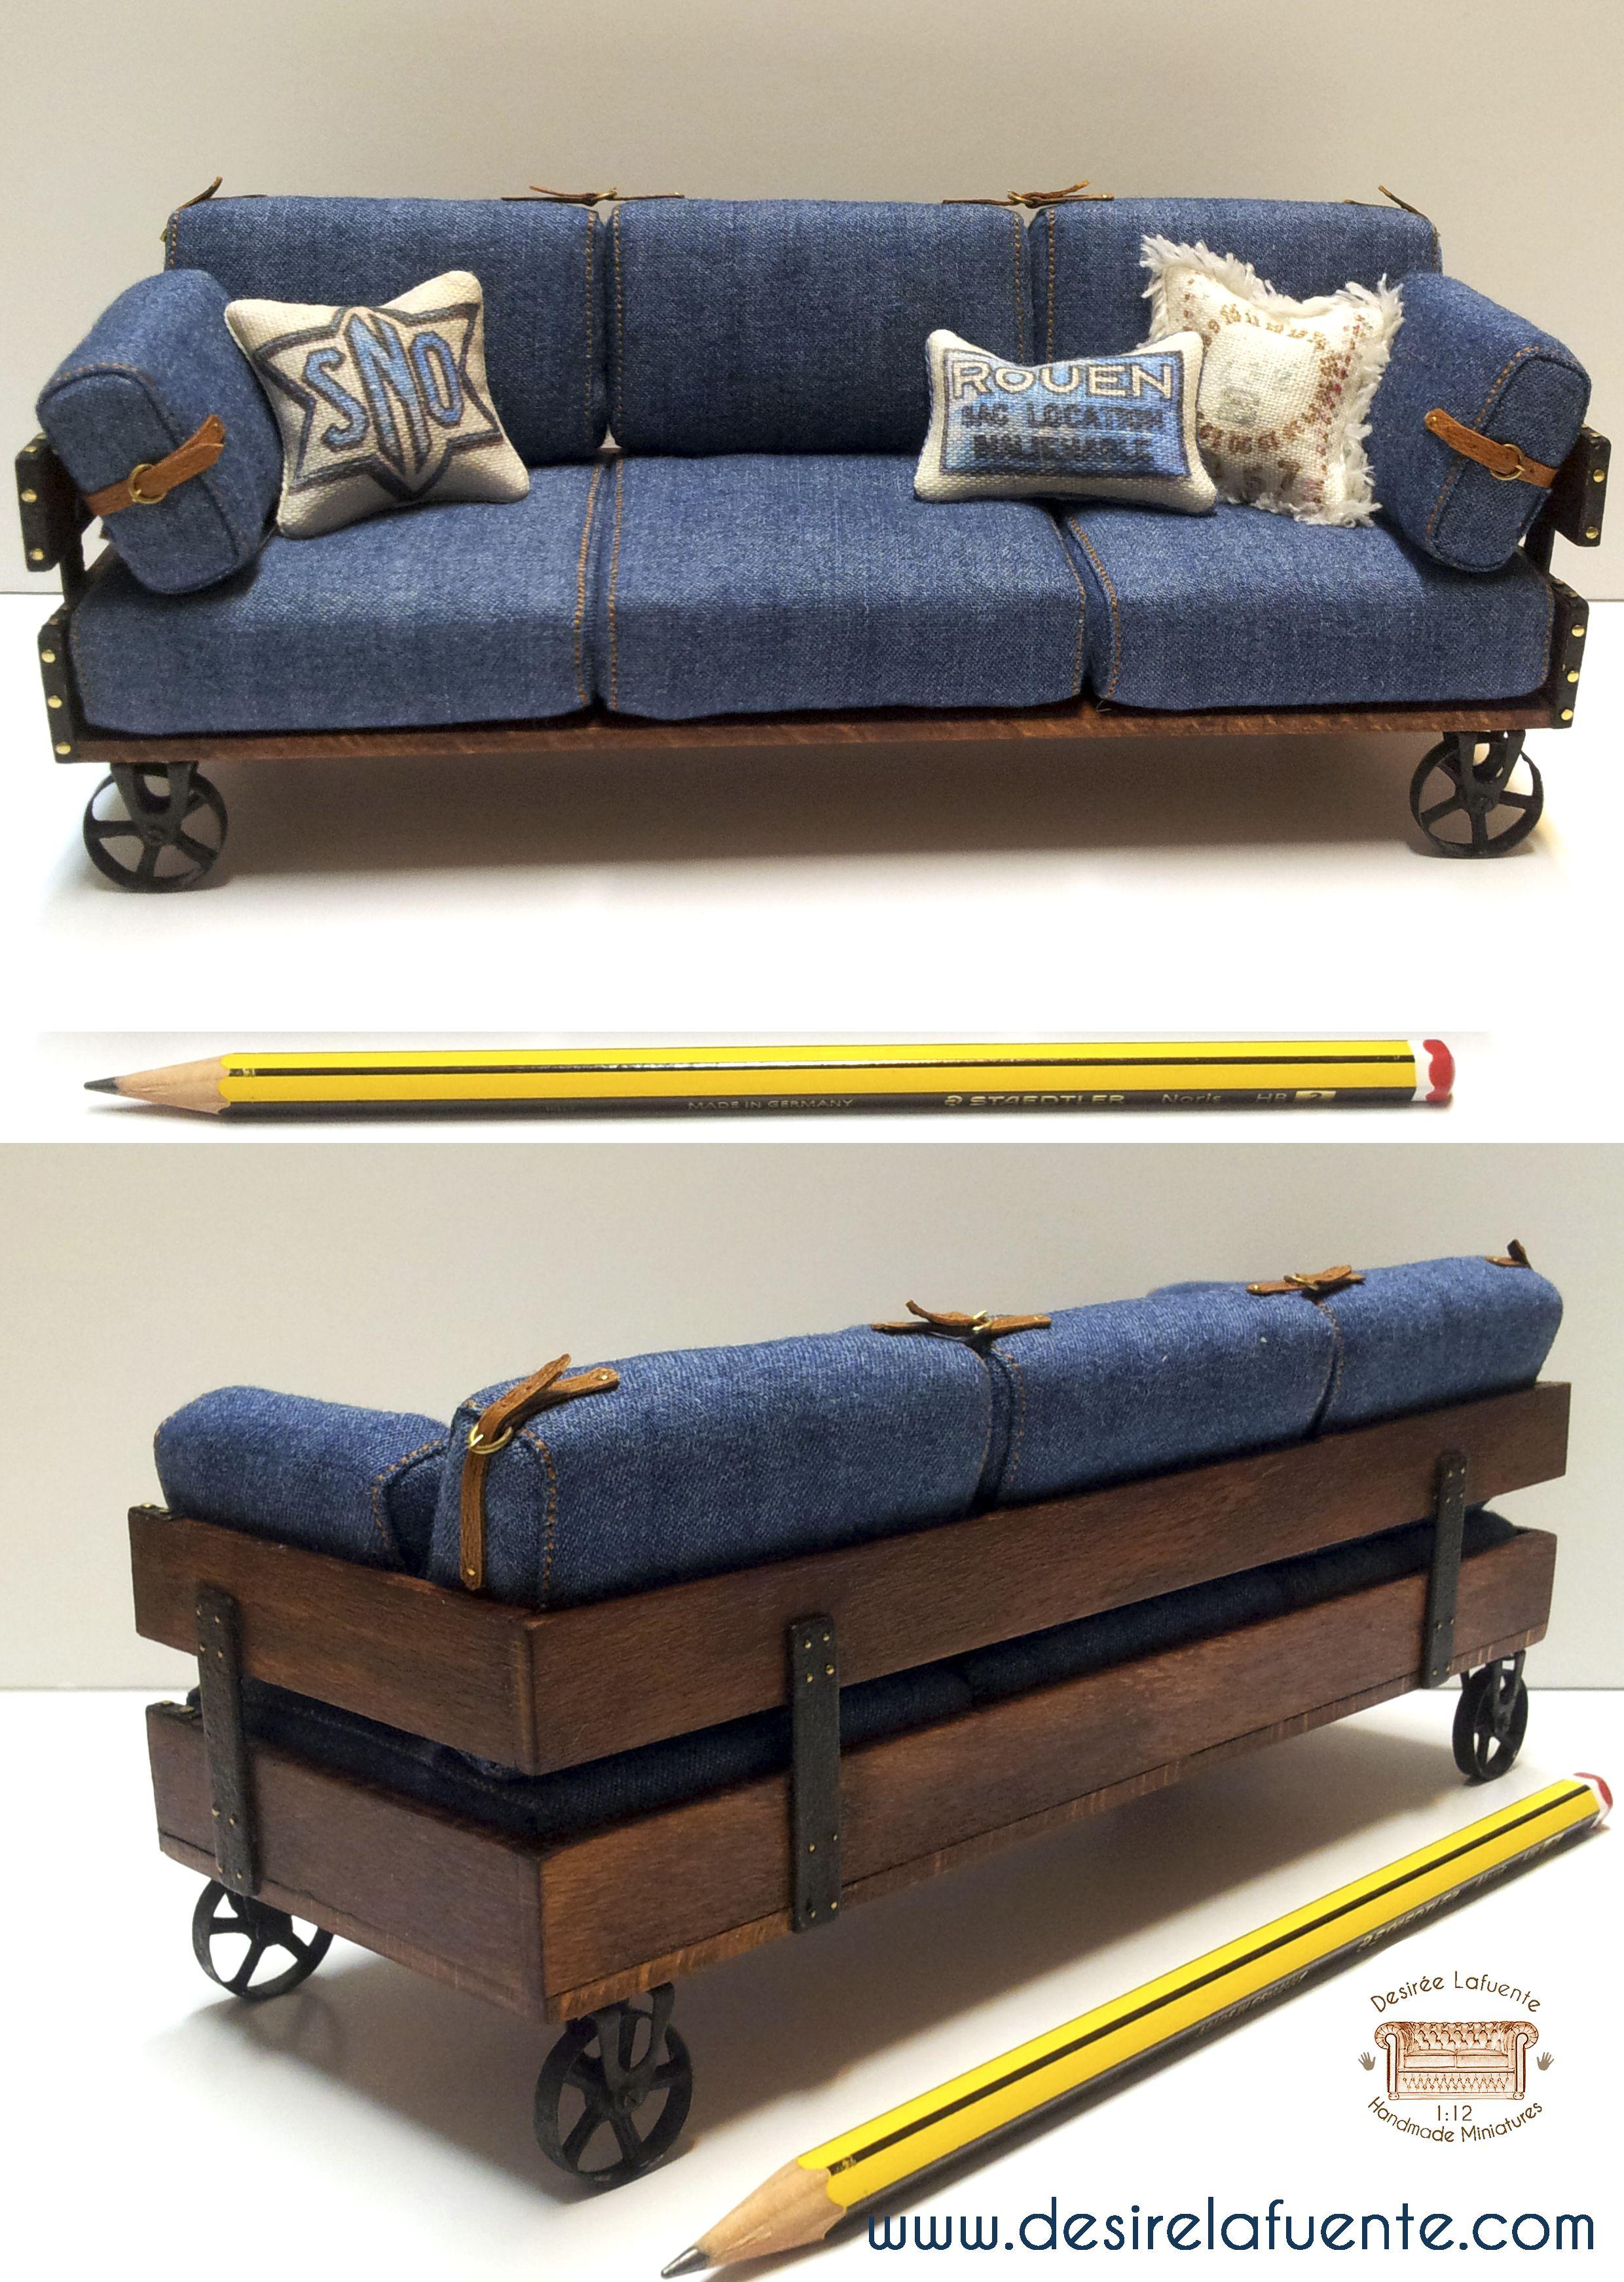 1 12 scale sofa materiales madera de haya tejido jeans - Tejidos para sofas ...